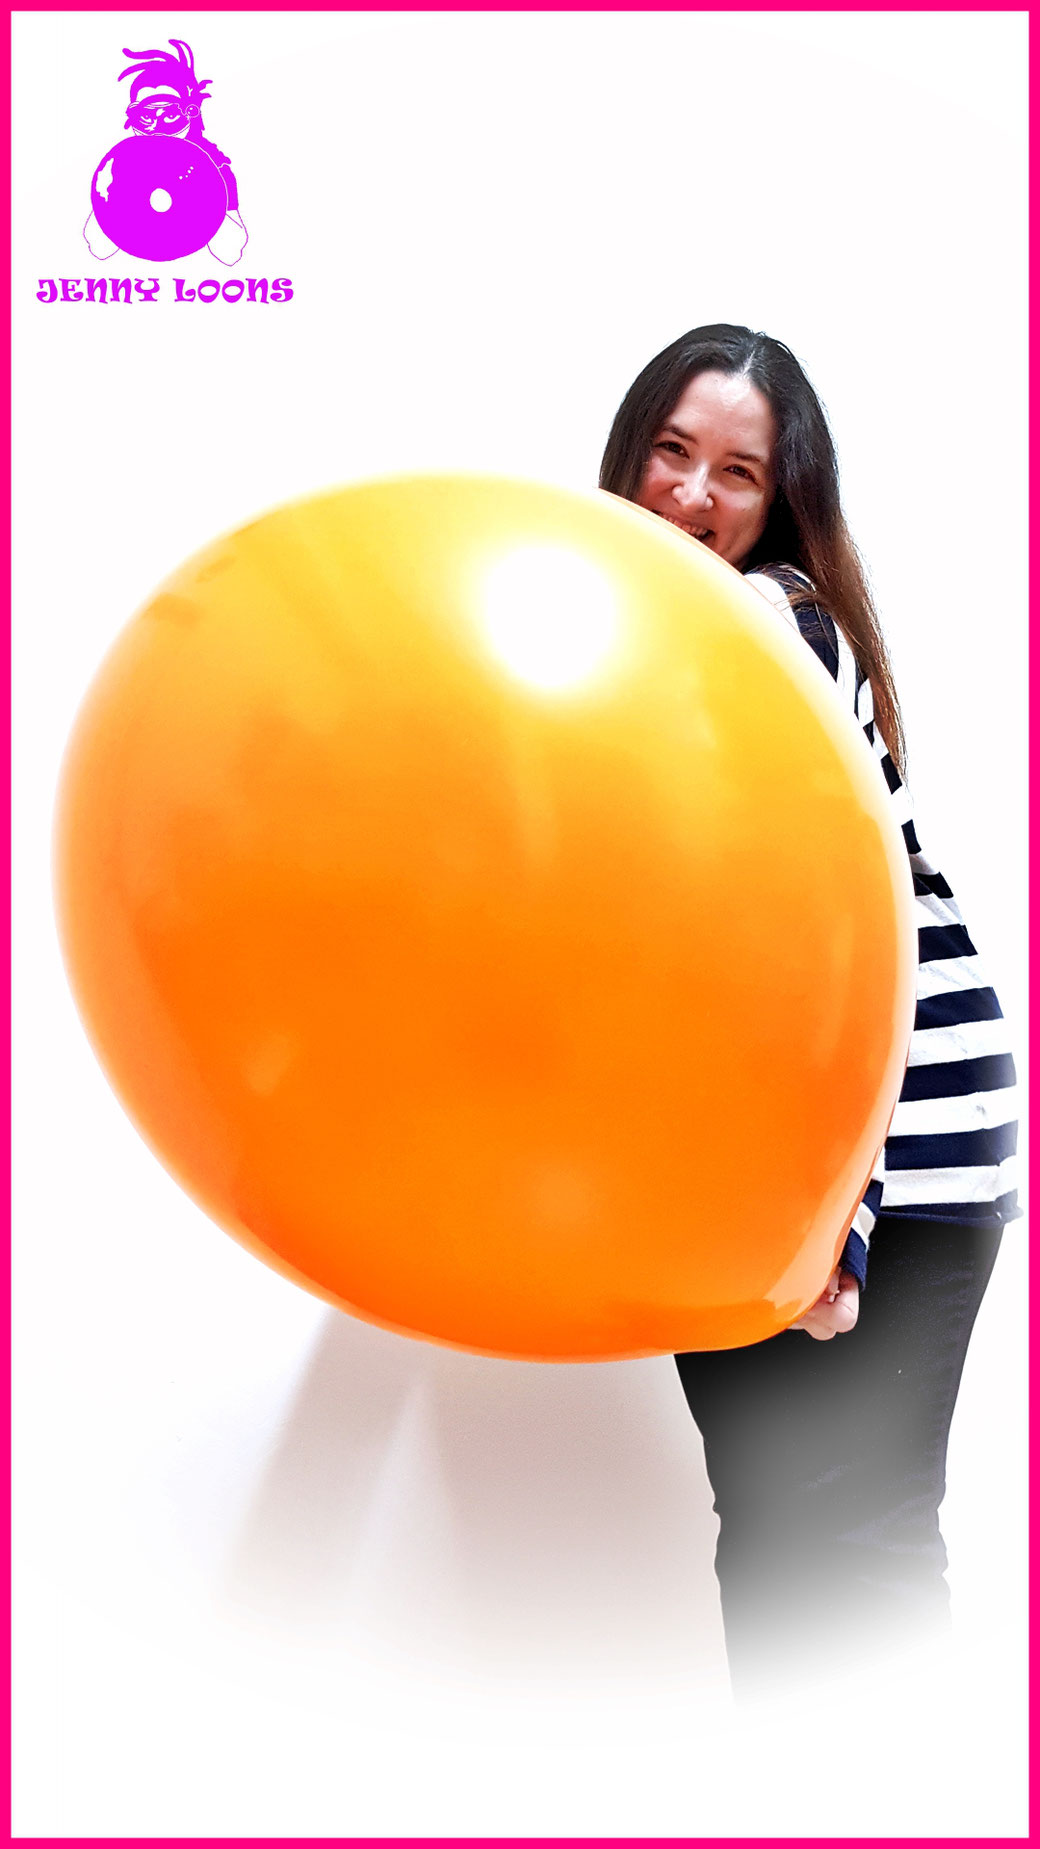 "TUFTEX TUF-TEX Luftballons Riesenballons Ballons Balloons 24inch 24"" 60cm Riese Giant Looner Standard colors orange fun party Hameln Ballonshop Heliumballons"